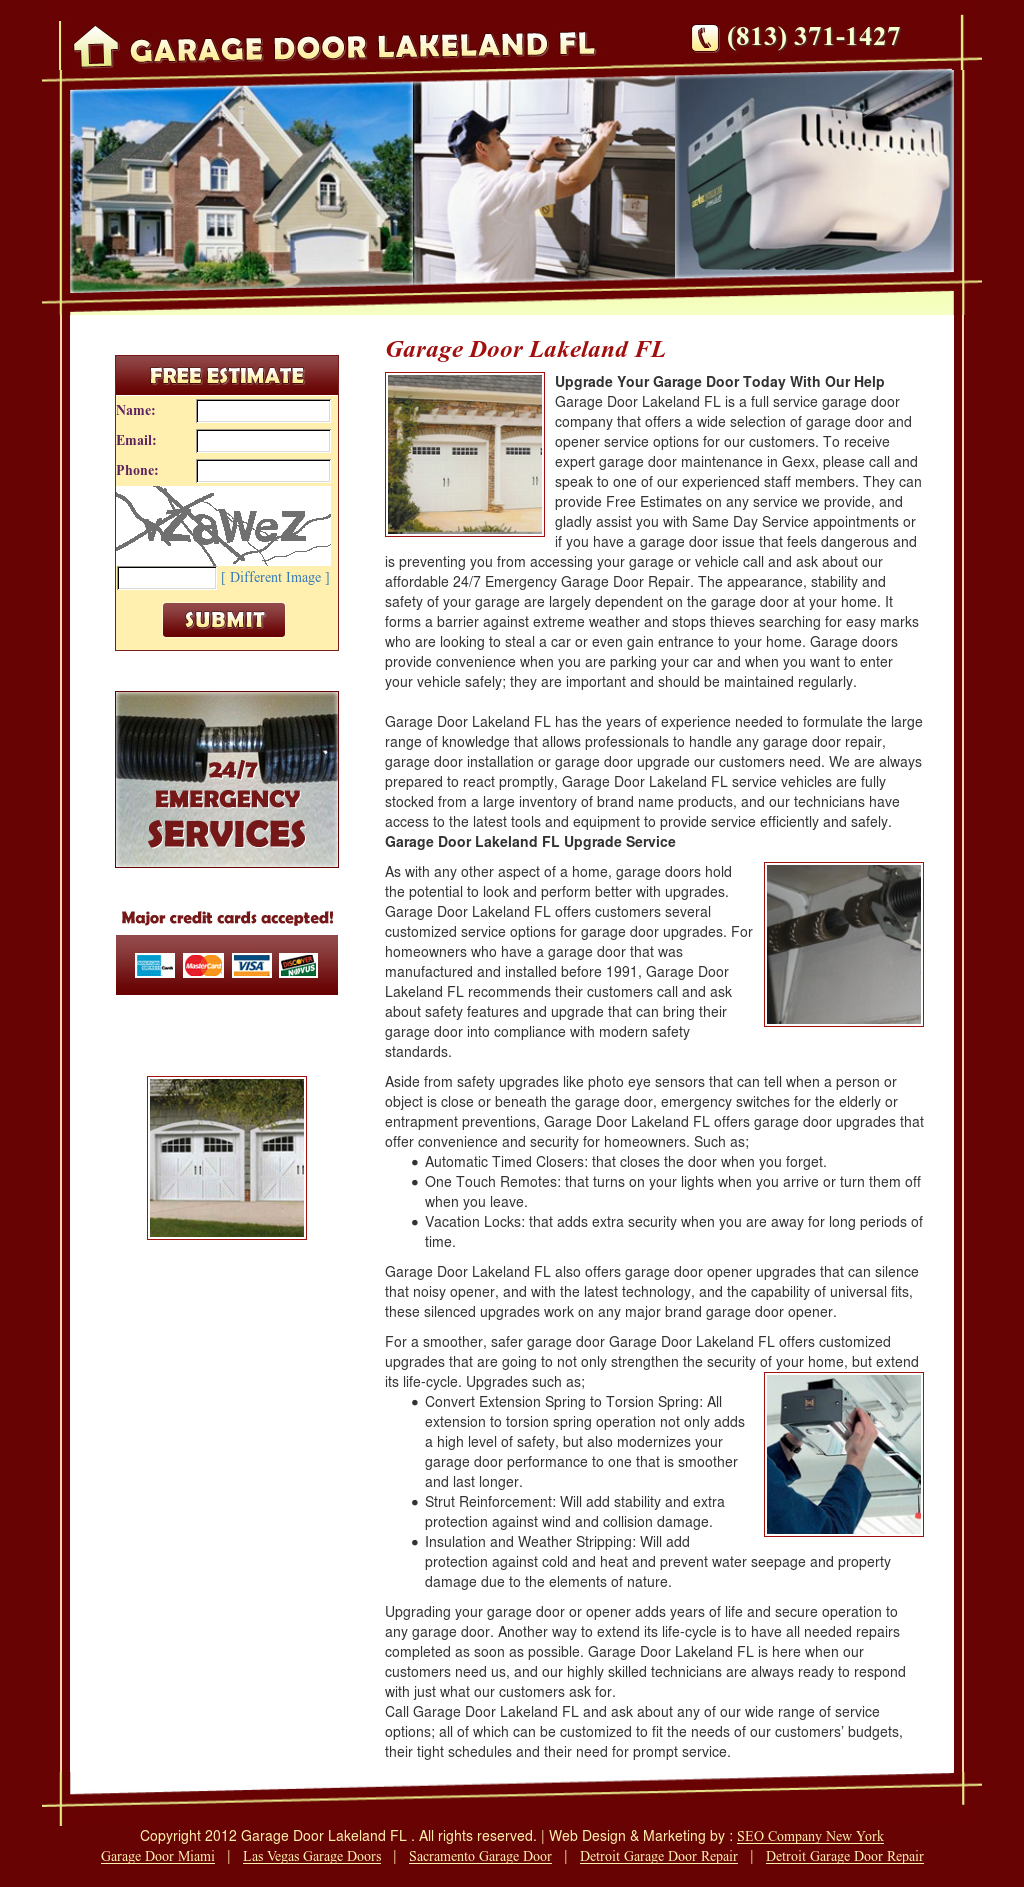 Garage Door Lakeland Fl Competitors, Revenue And Employees ...